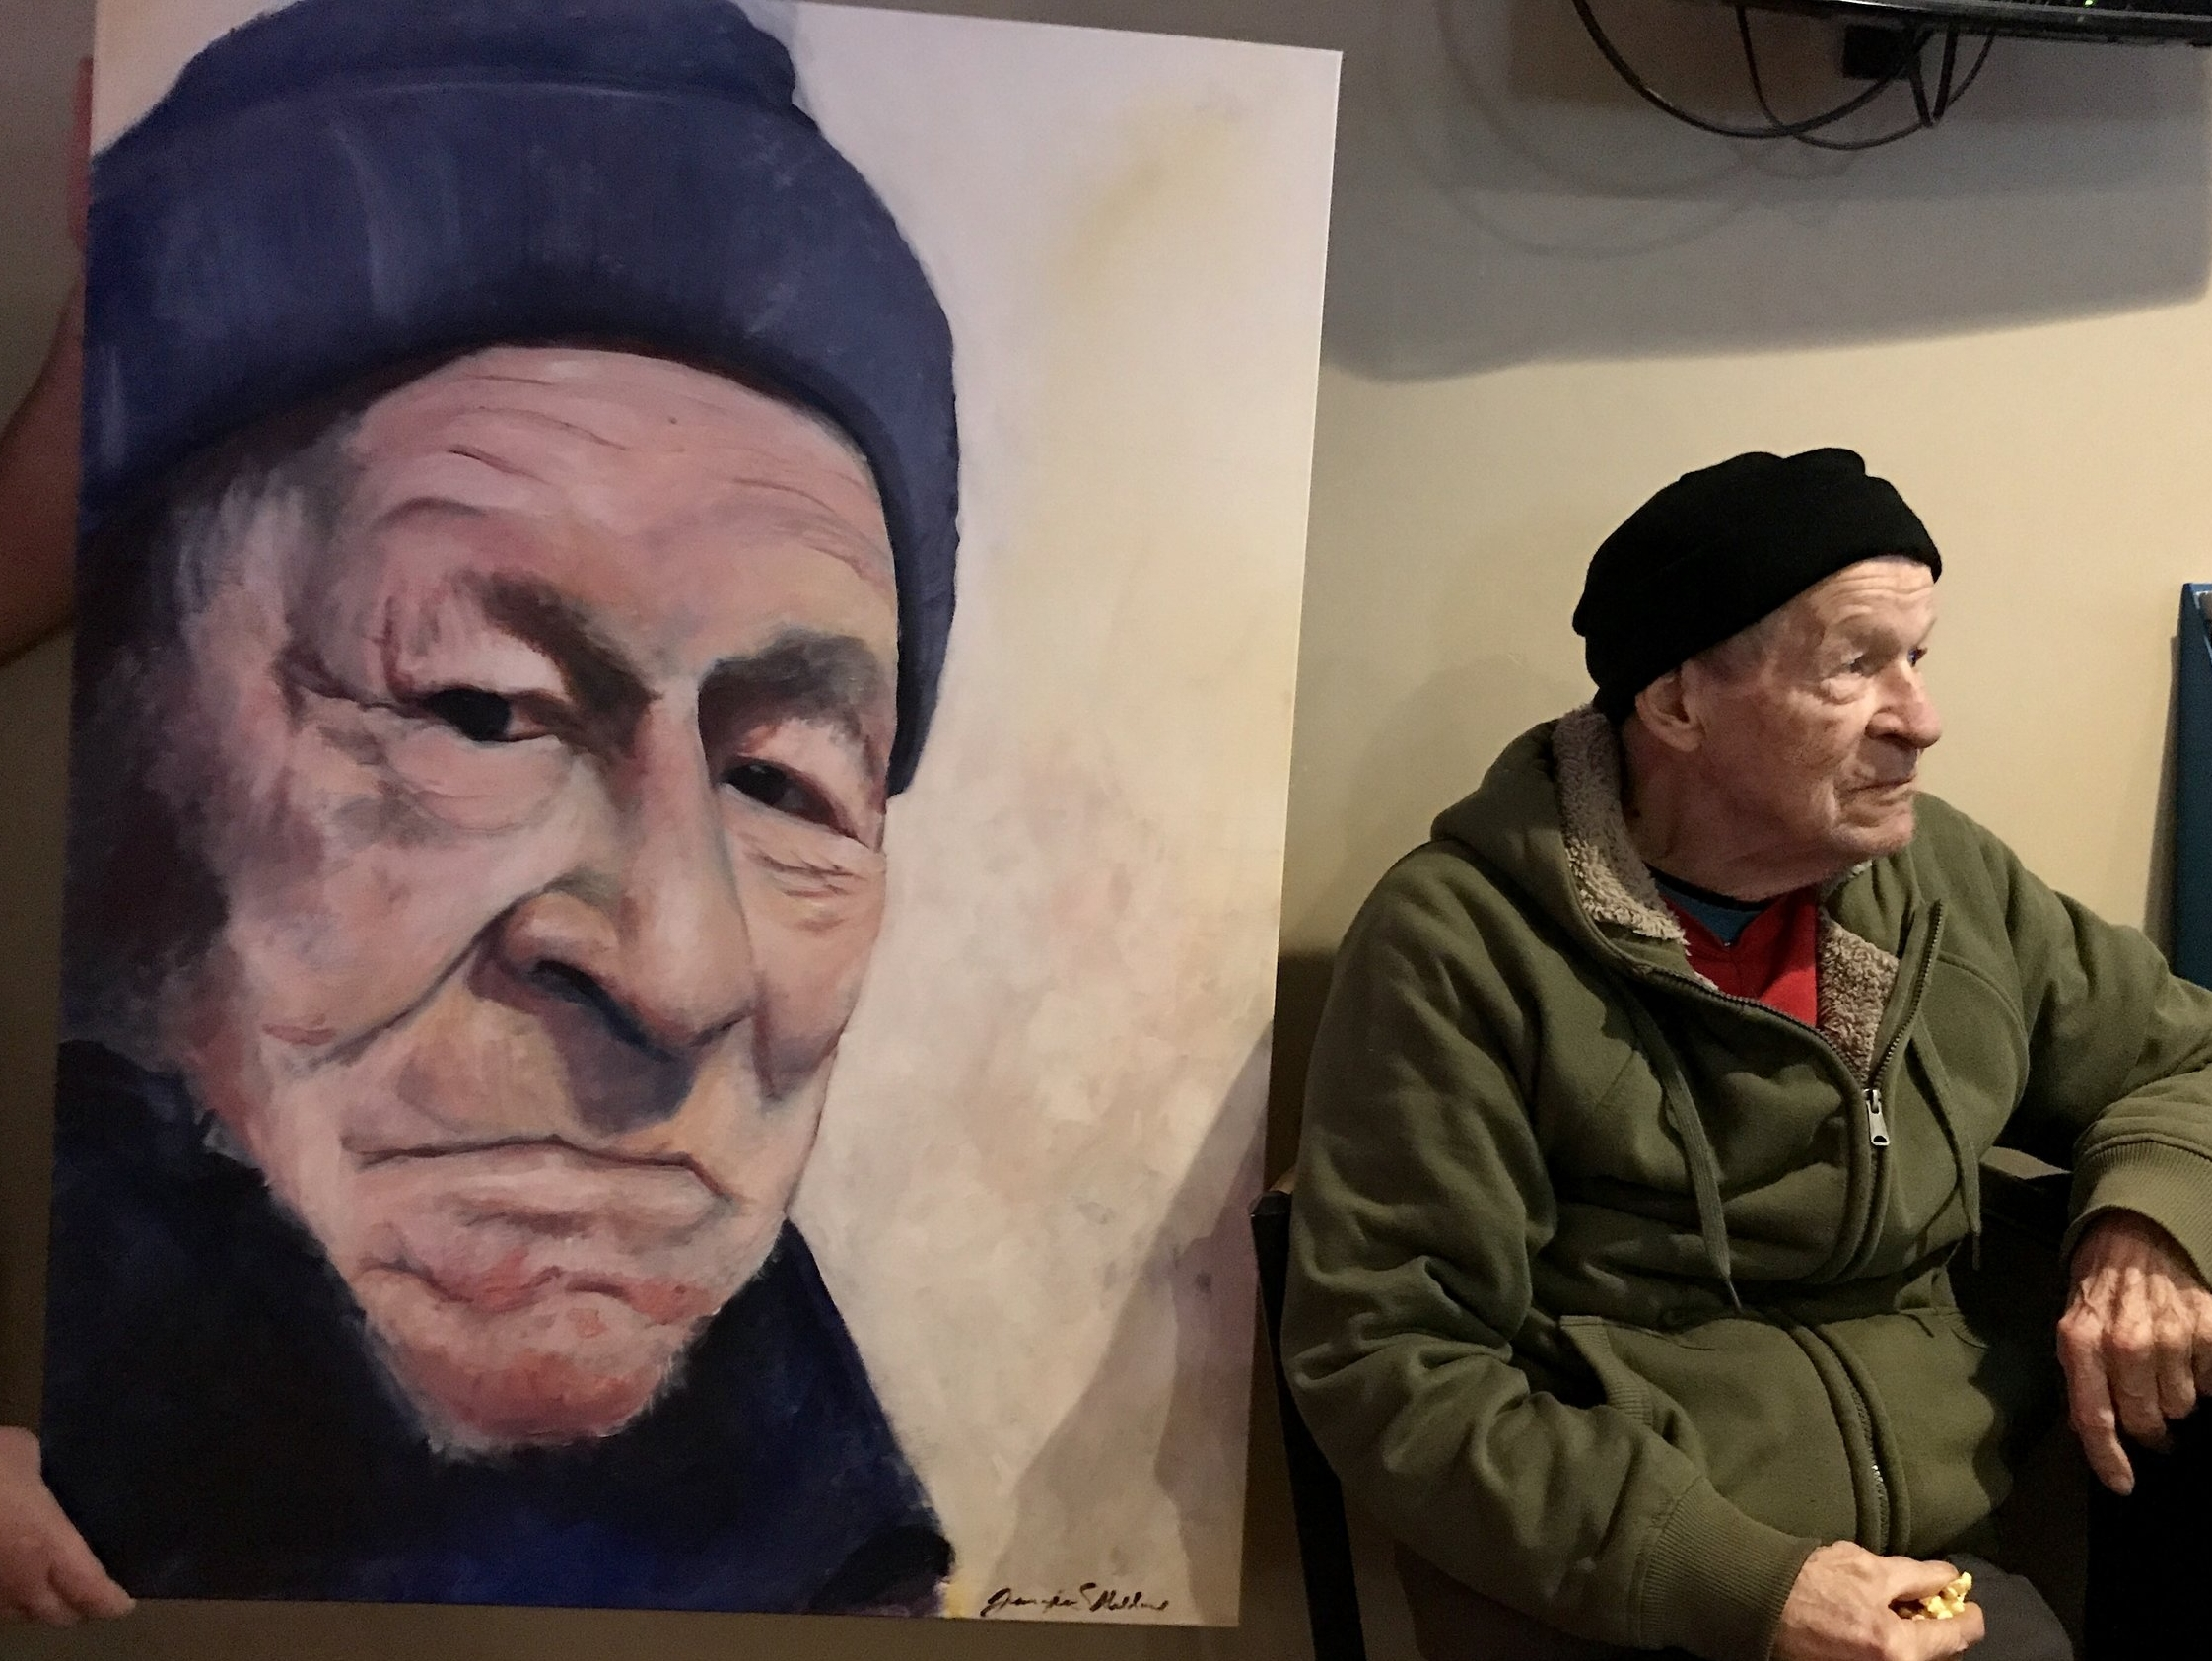 Dan and his portrait